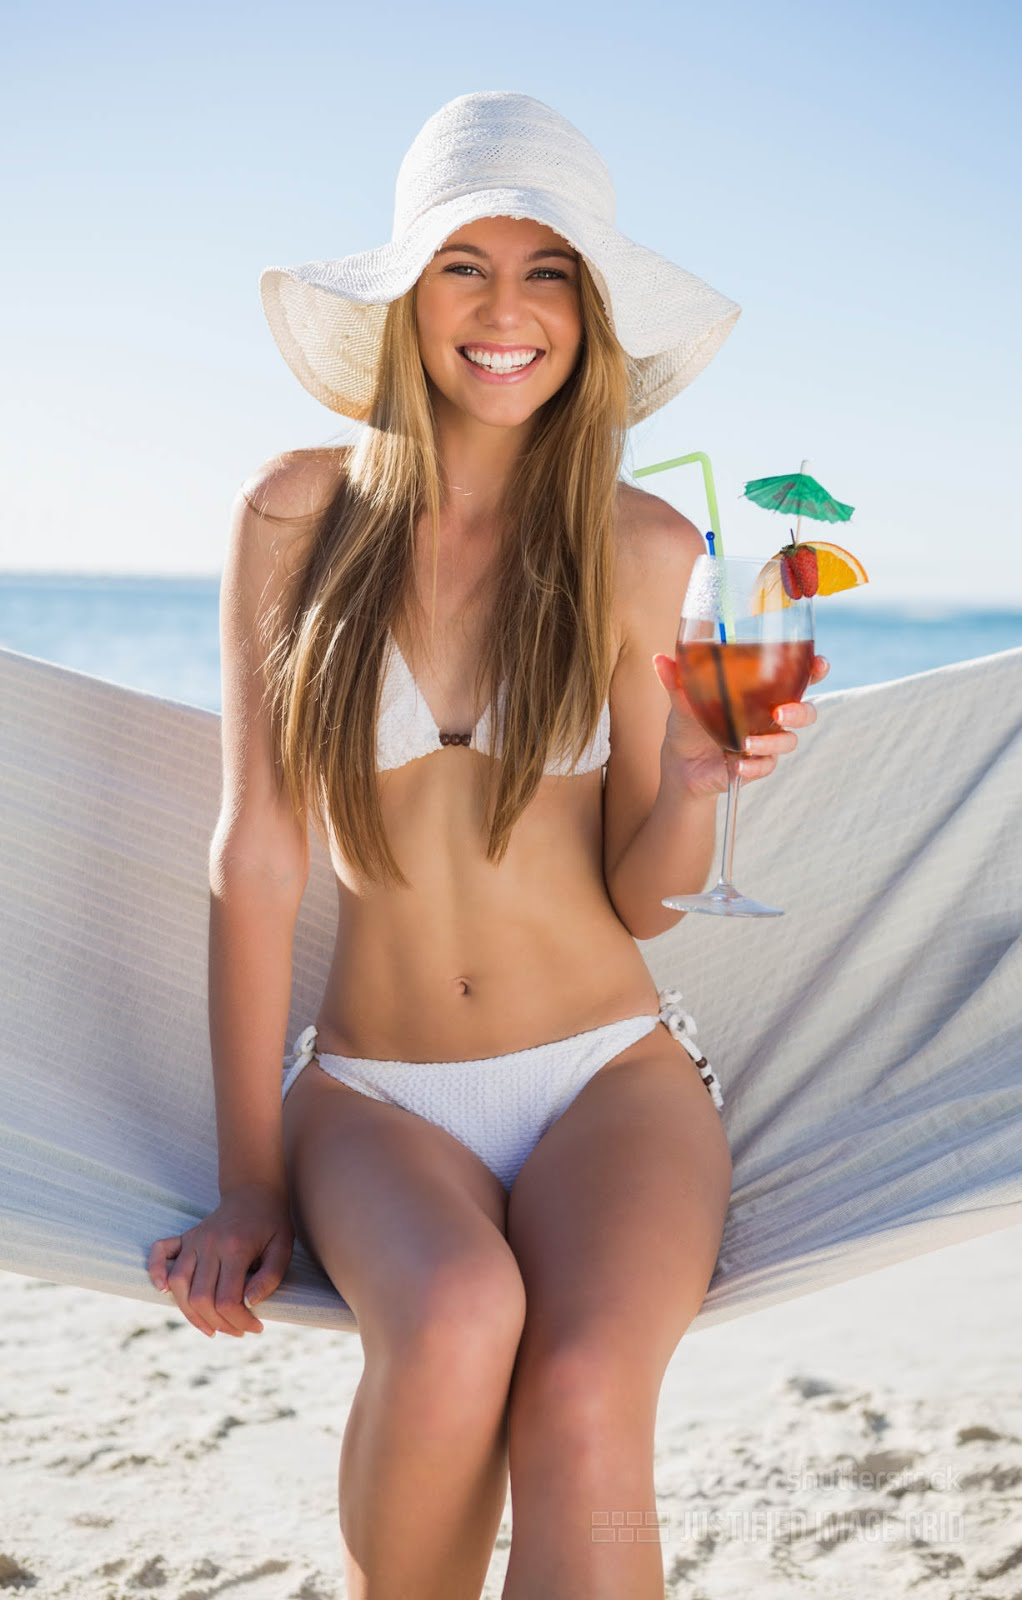 Girl Back Side Wallpaper Photo Gallery Free Premium Wallpapers Hot Bikini Girls